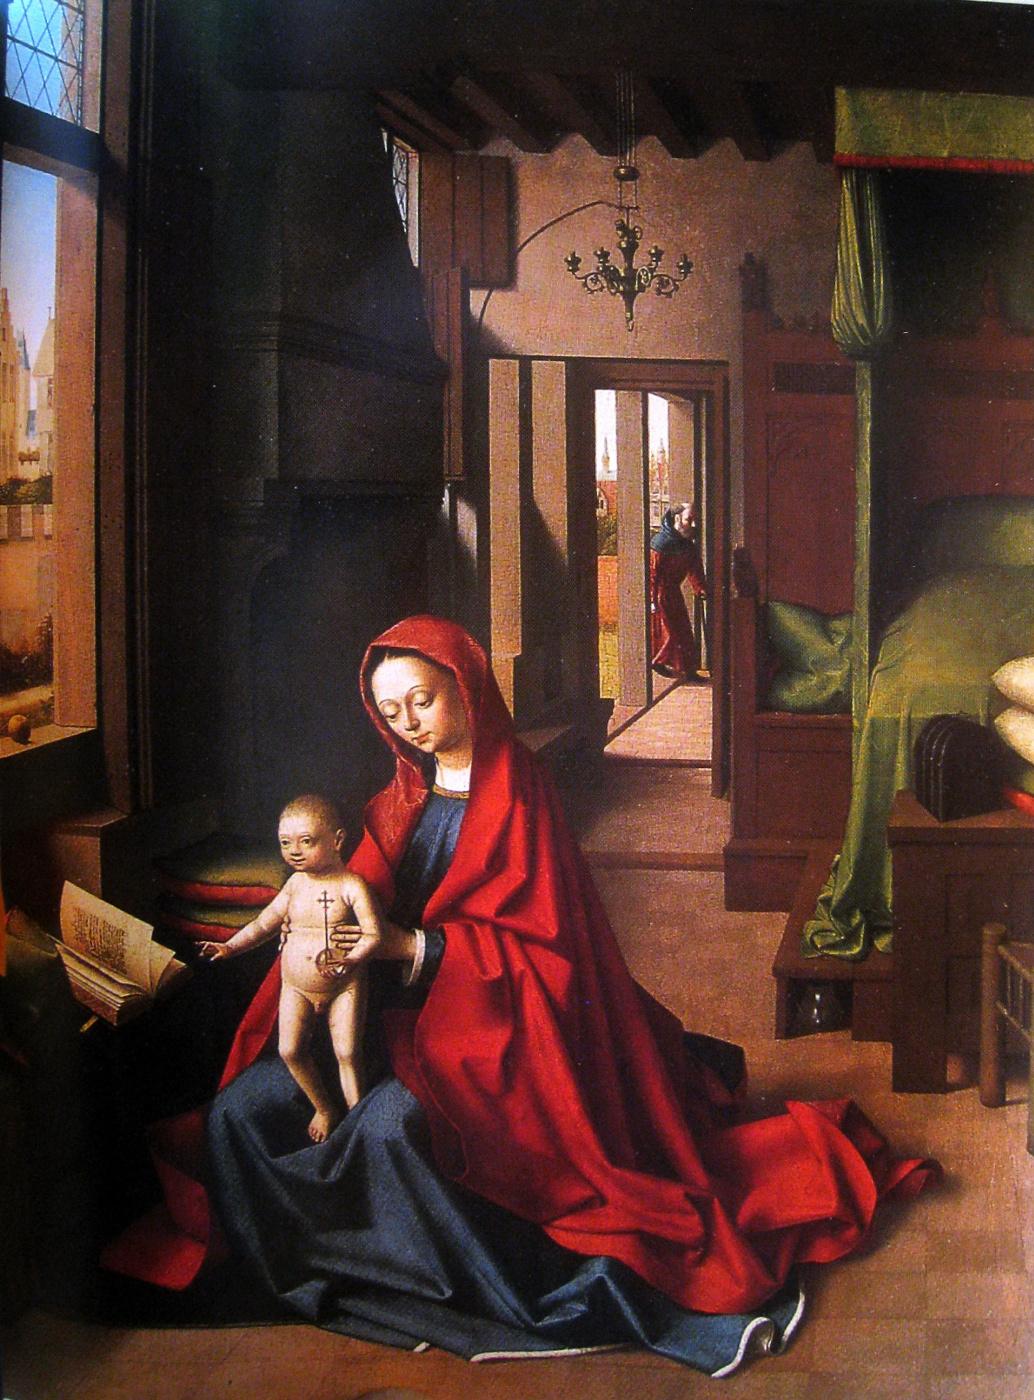 Petrus Christus. The Madonna and child in the interior